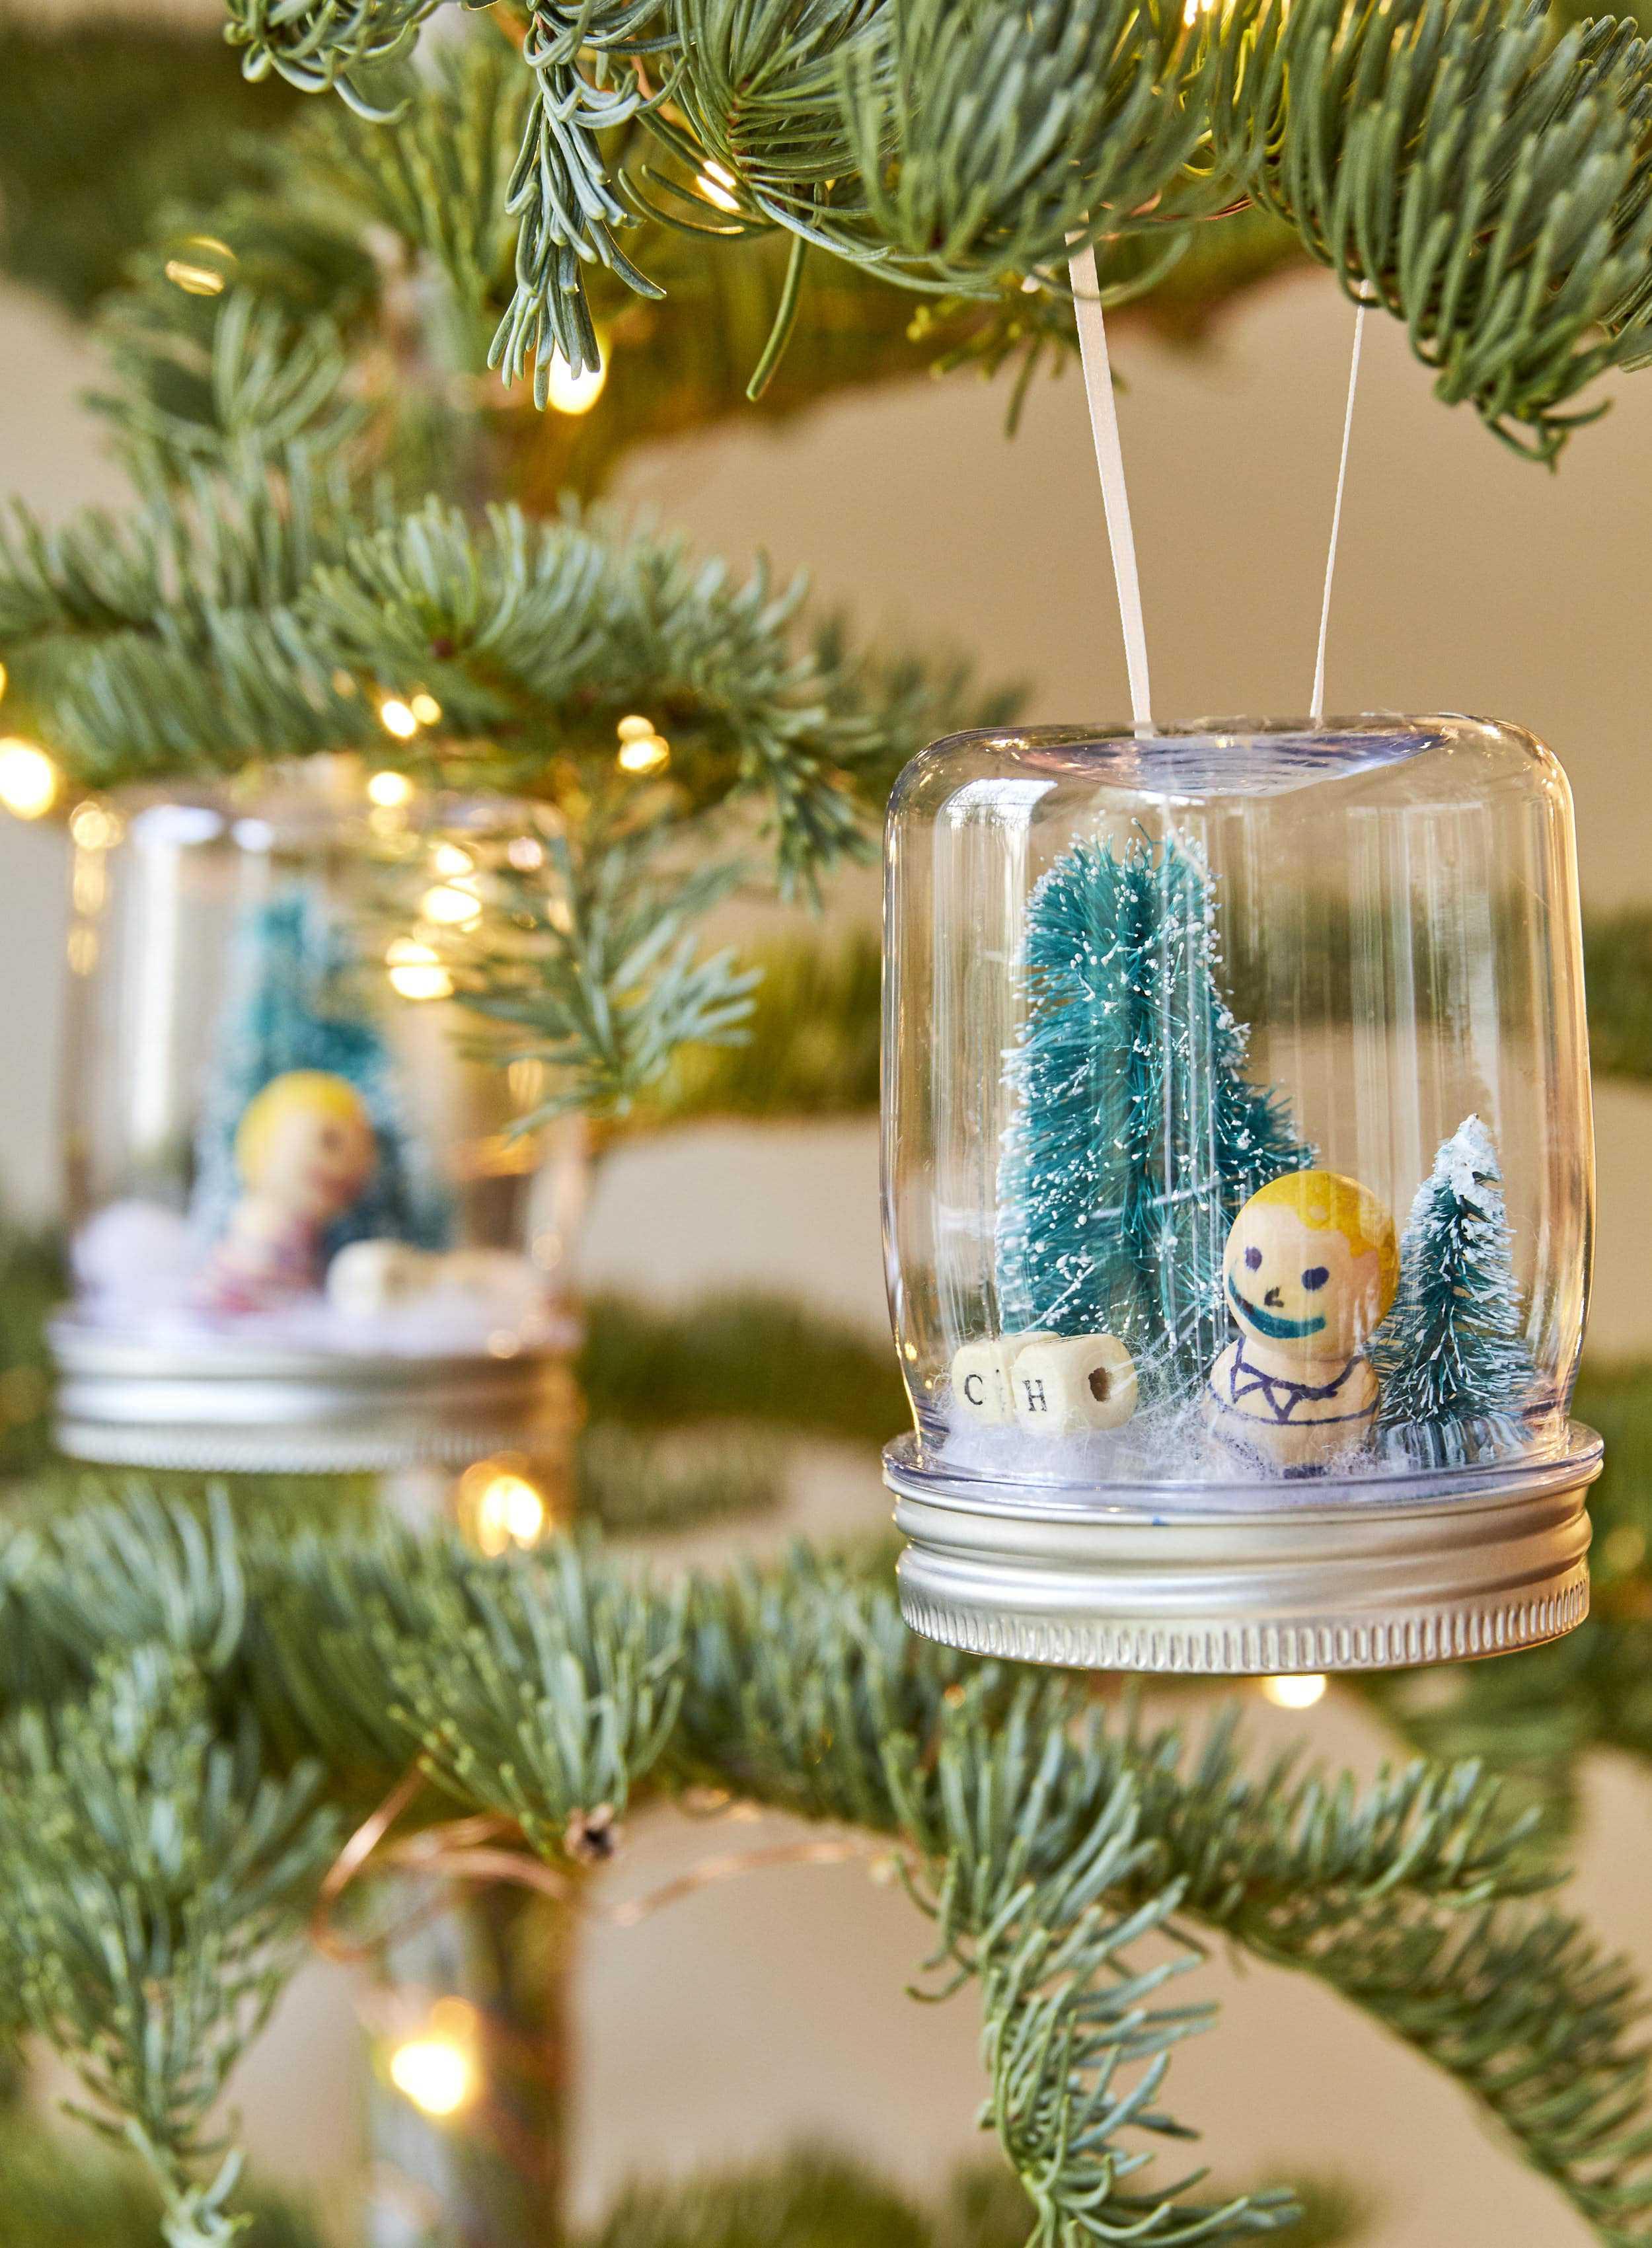 Diy Ornaments Lores 9